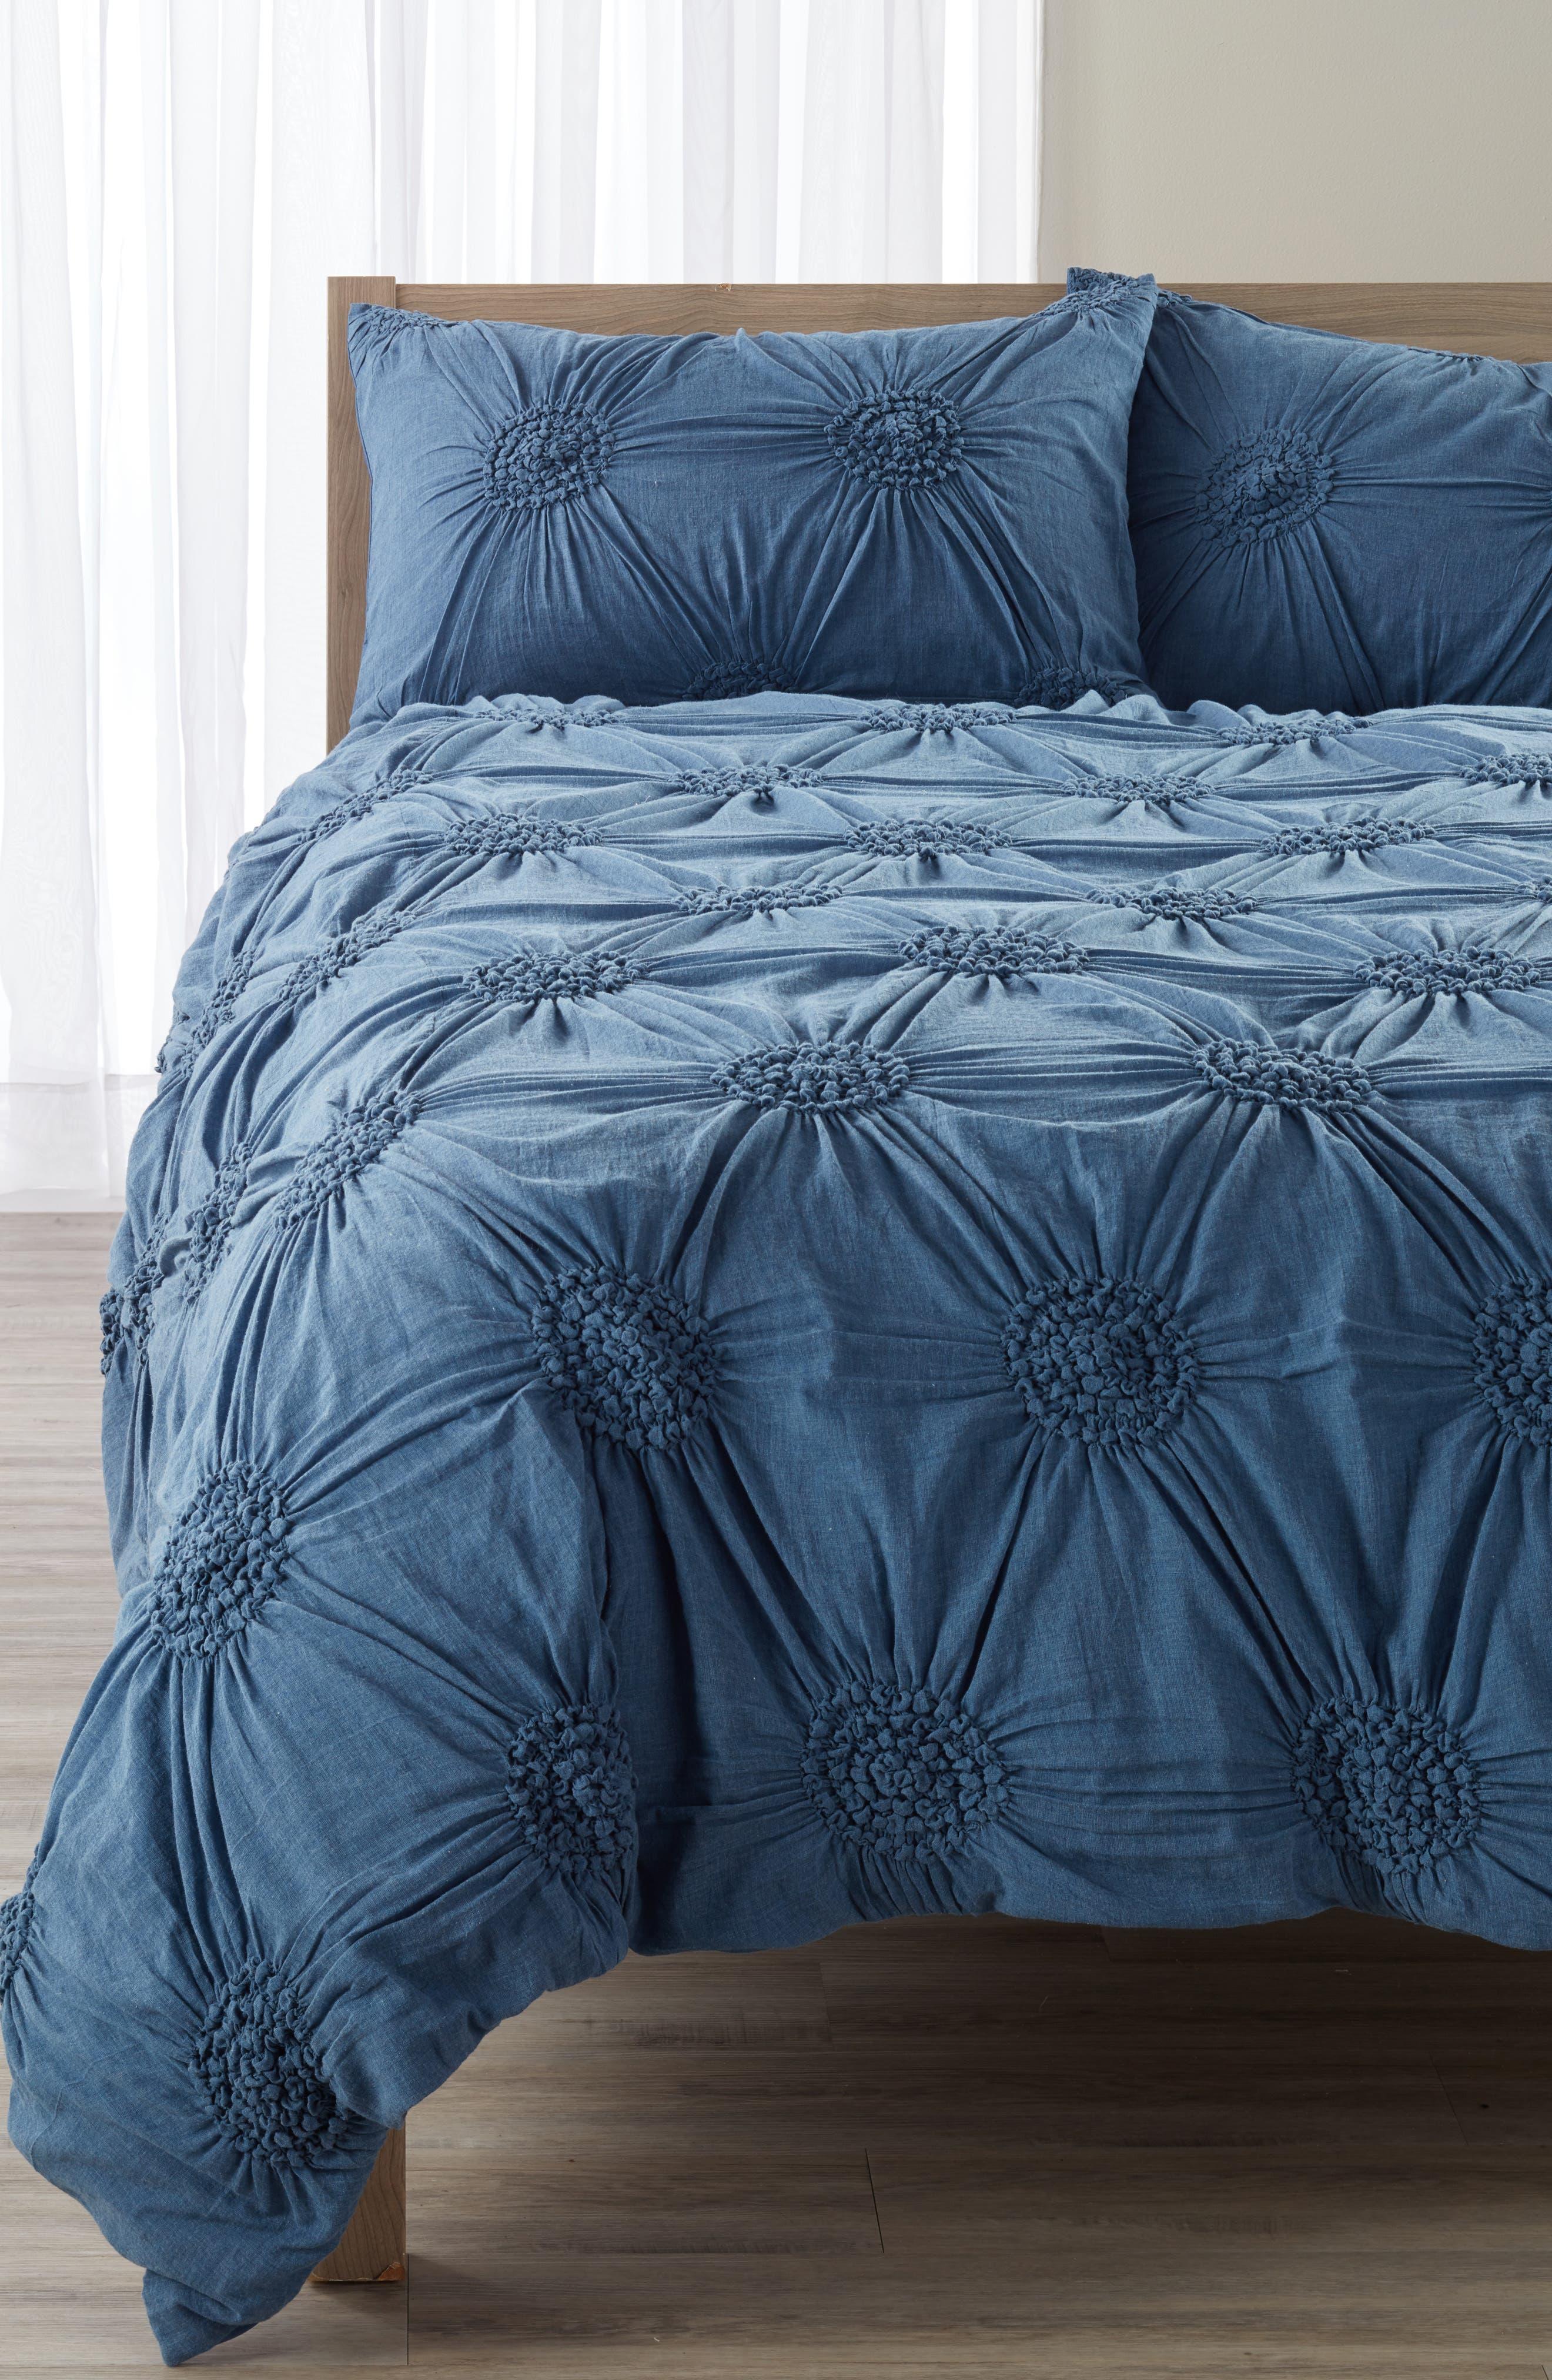 'Chloe' Duvet Cover,                         Main,                         color, Blue Moonlight Heather